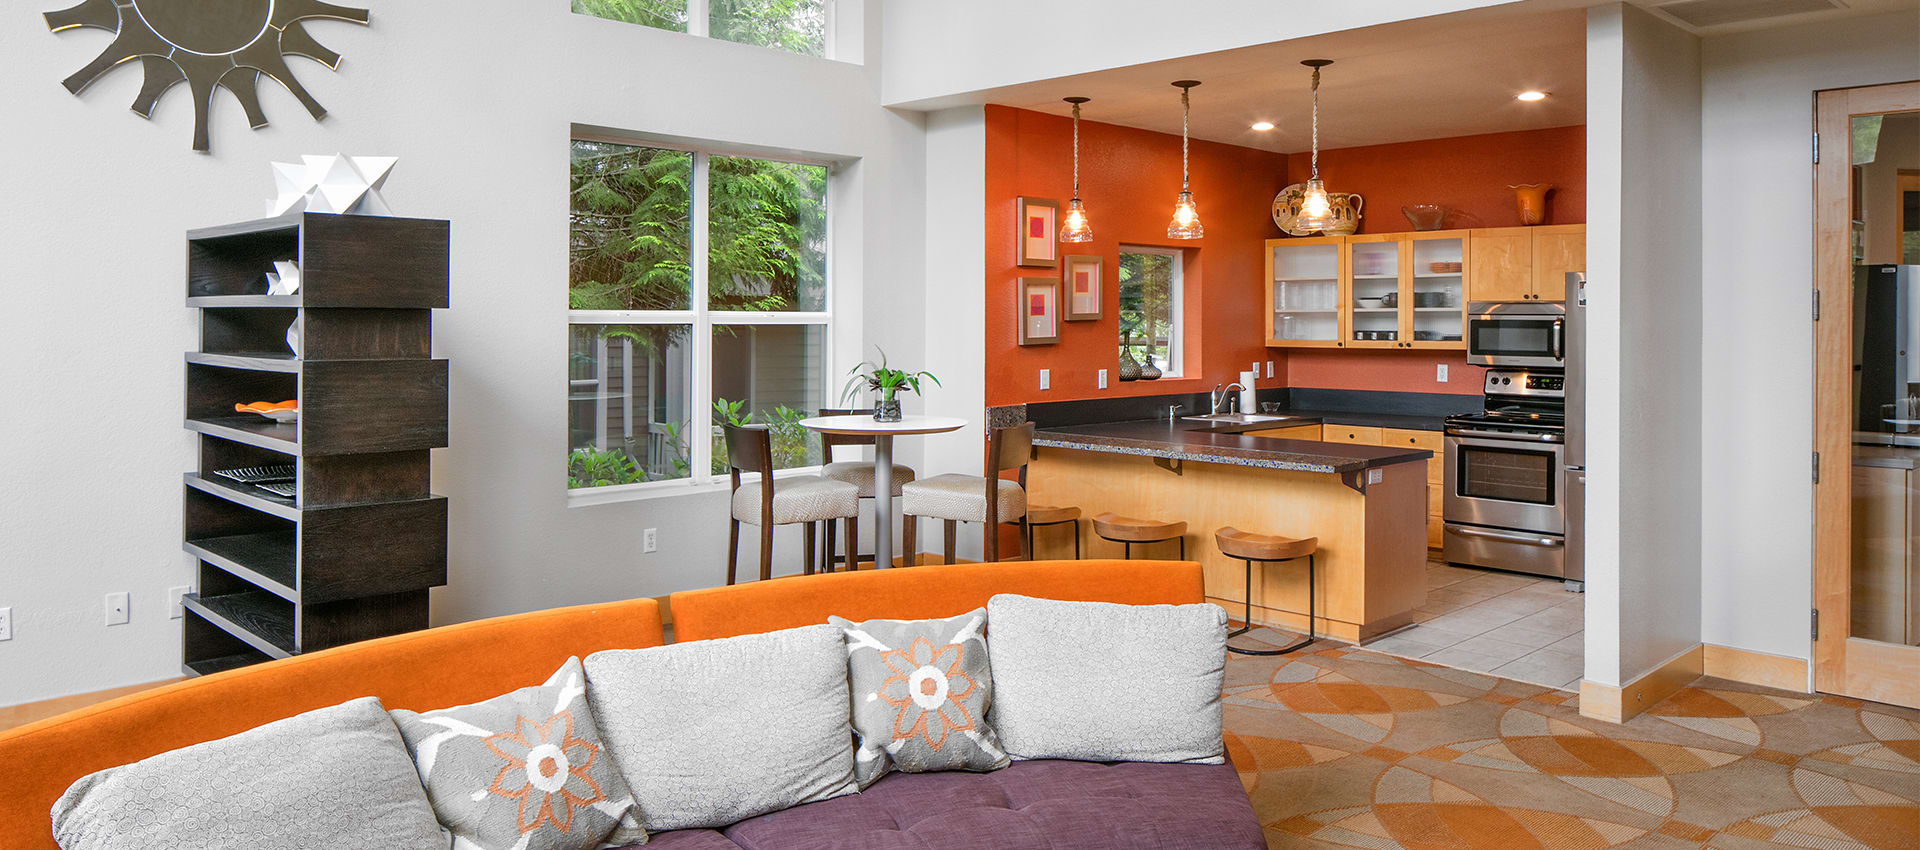 Kitchen at Center Pointe Apartment Homes in Beaverton, Oregon